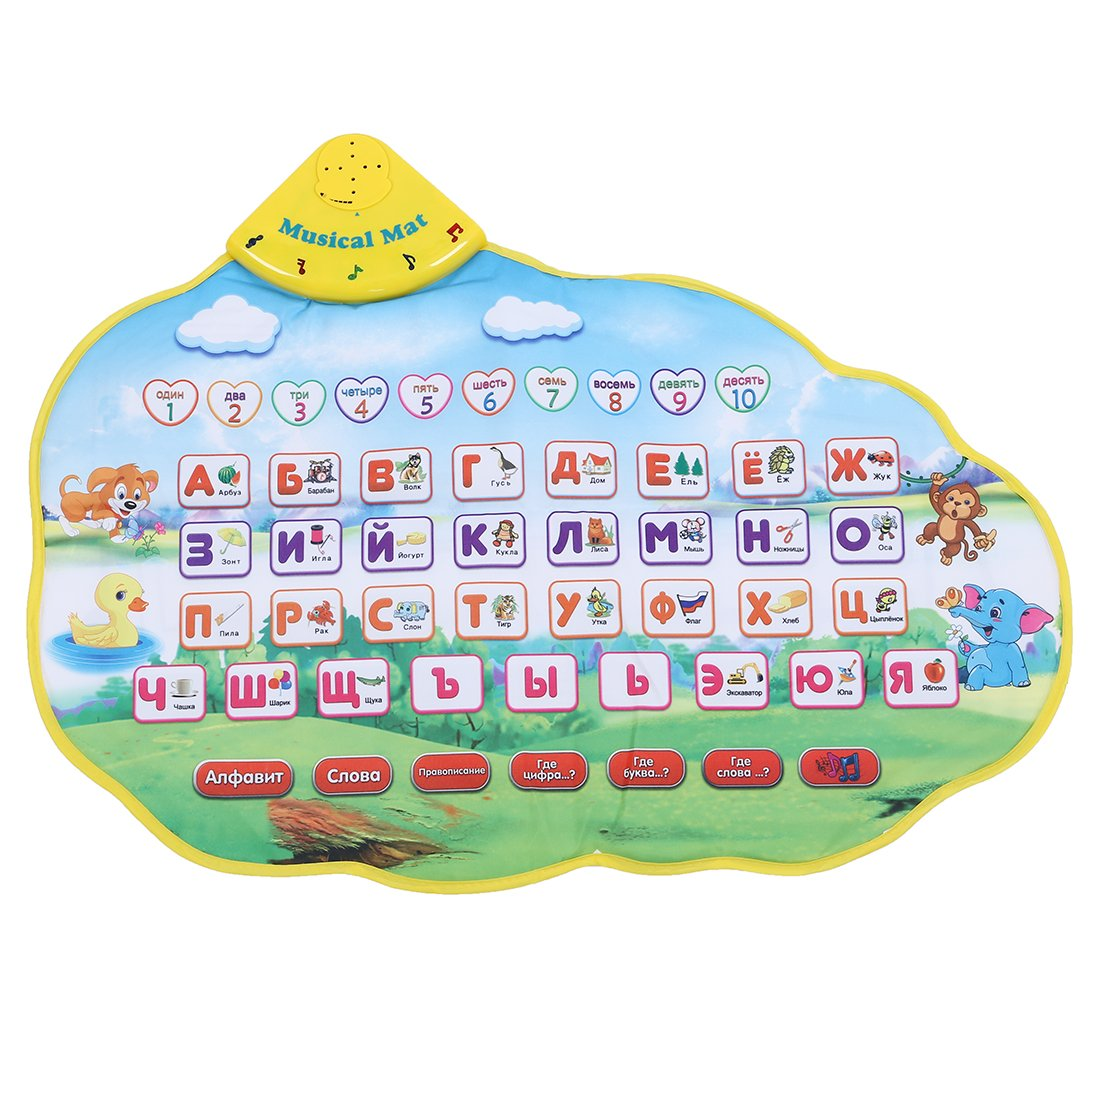 TOOGOO Estera de aprendizaje de nino Juguete de lengua rusa Estera de alfabetos divertido Alfombra de sonido fonetica de aprendizaje educativo Juguete ABC 050659